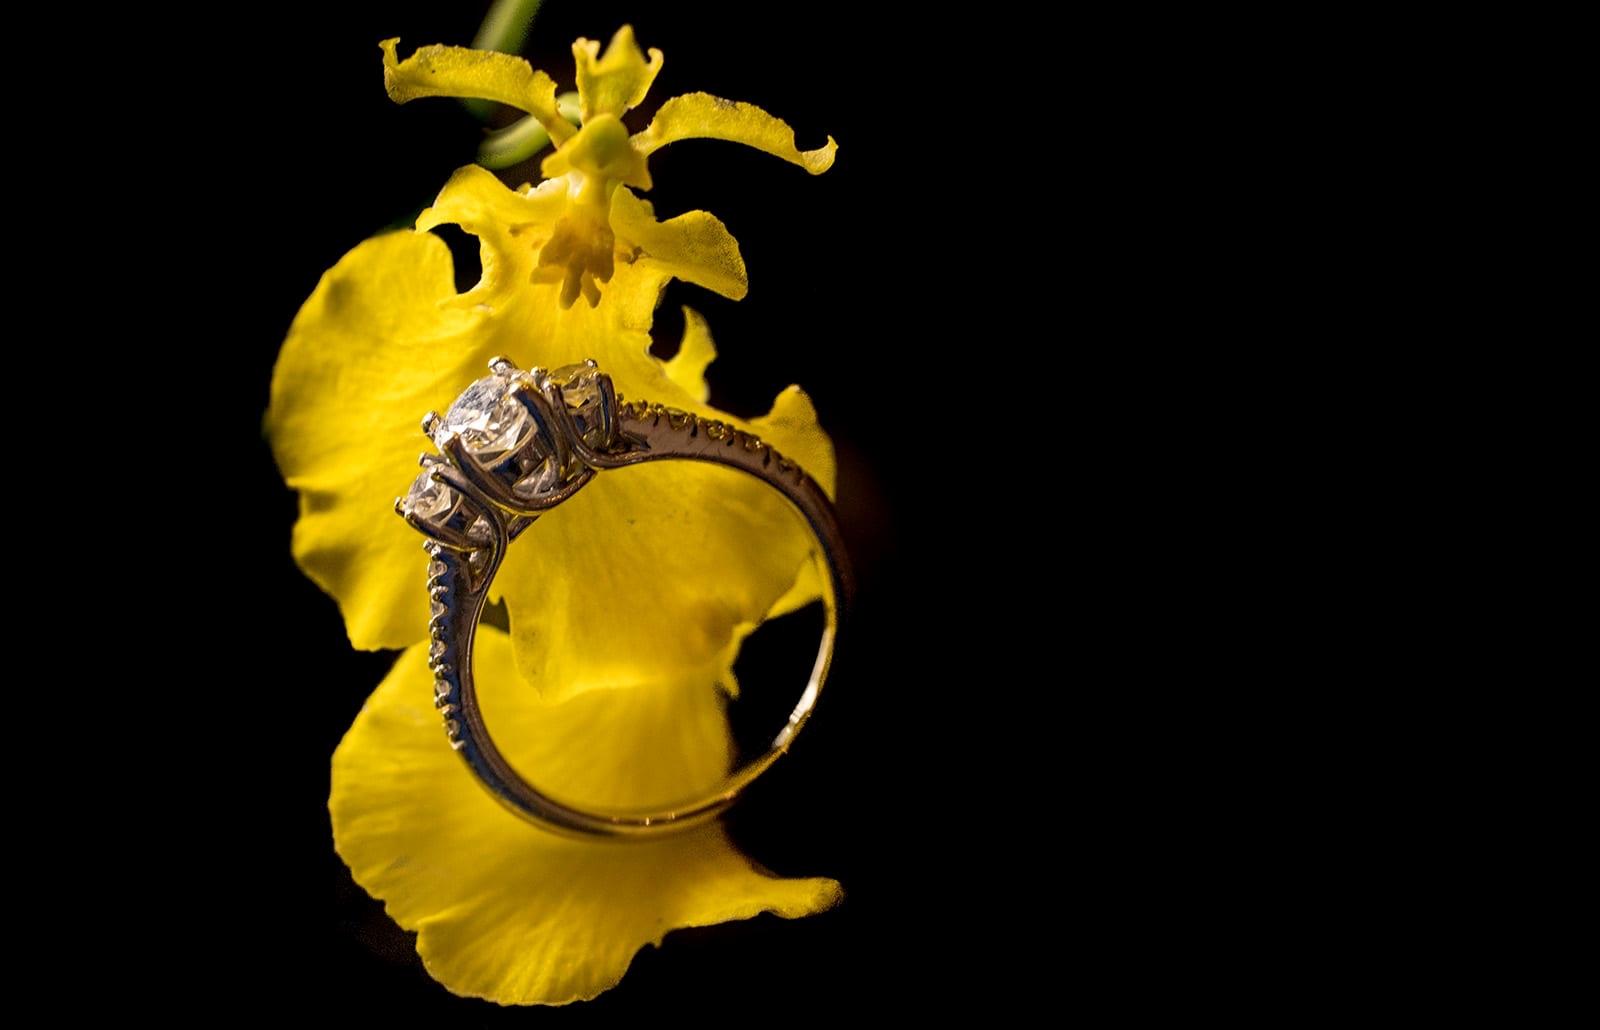 Hawaii-Wedding-Photographer-Ring-Details-Engagement-Ring-Off-camera-flash-macro-18.jpg